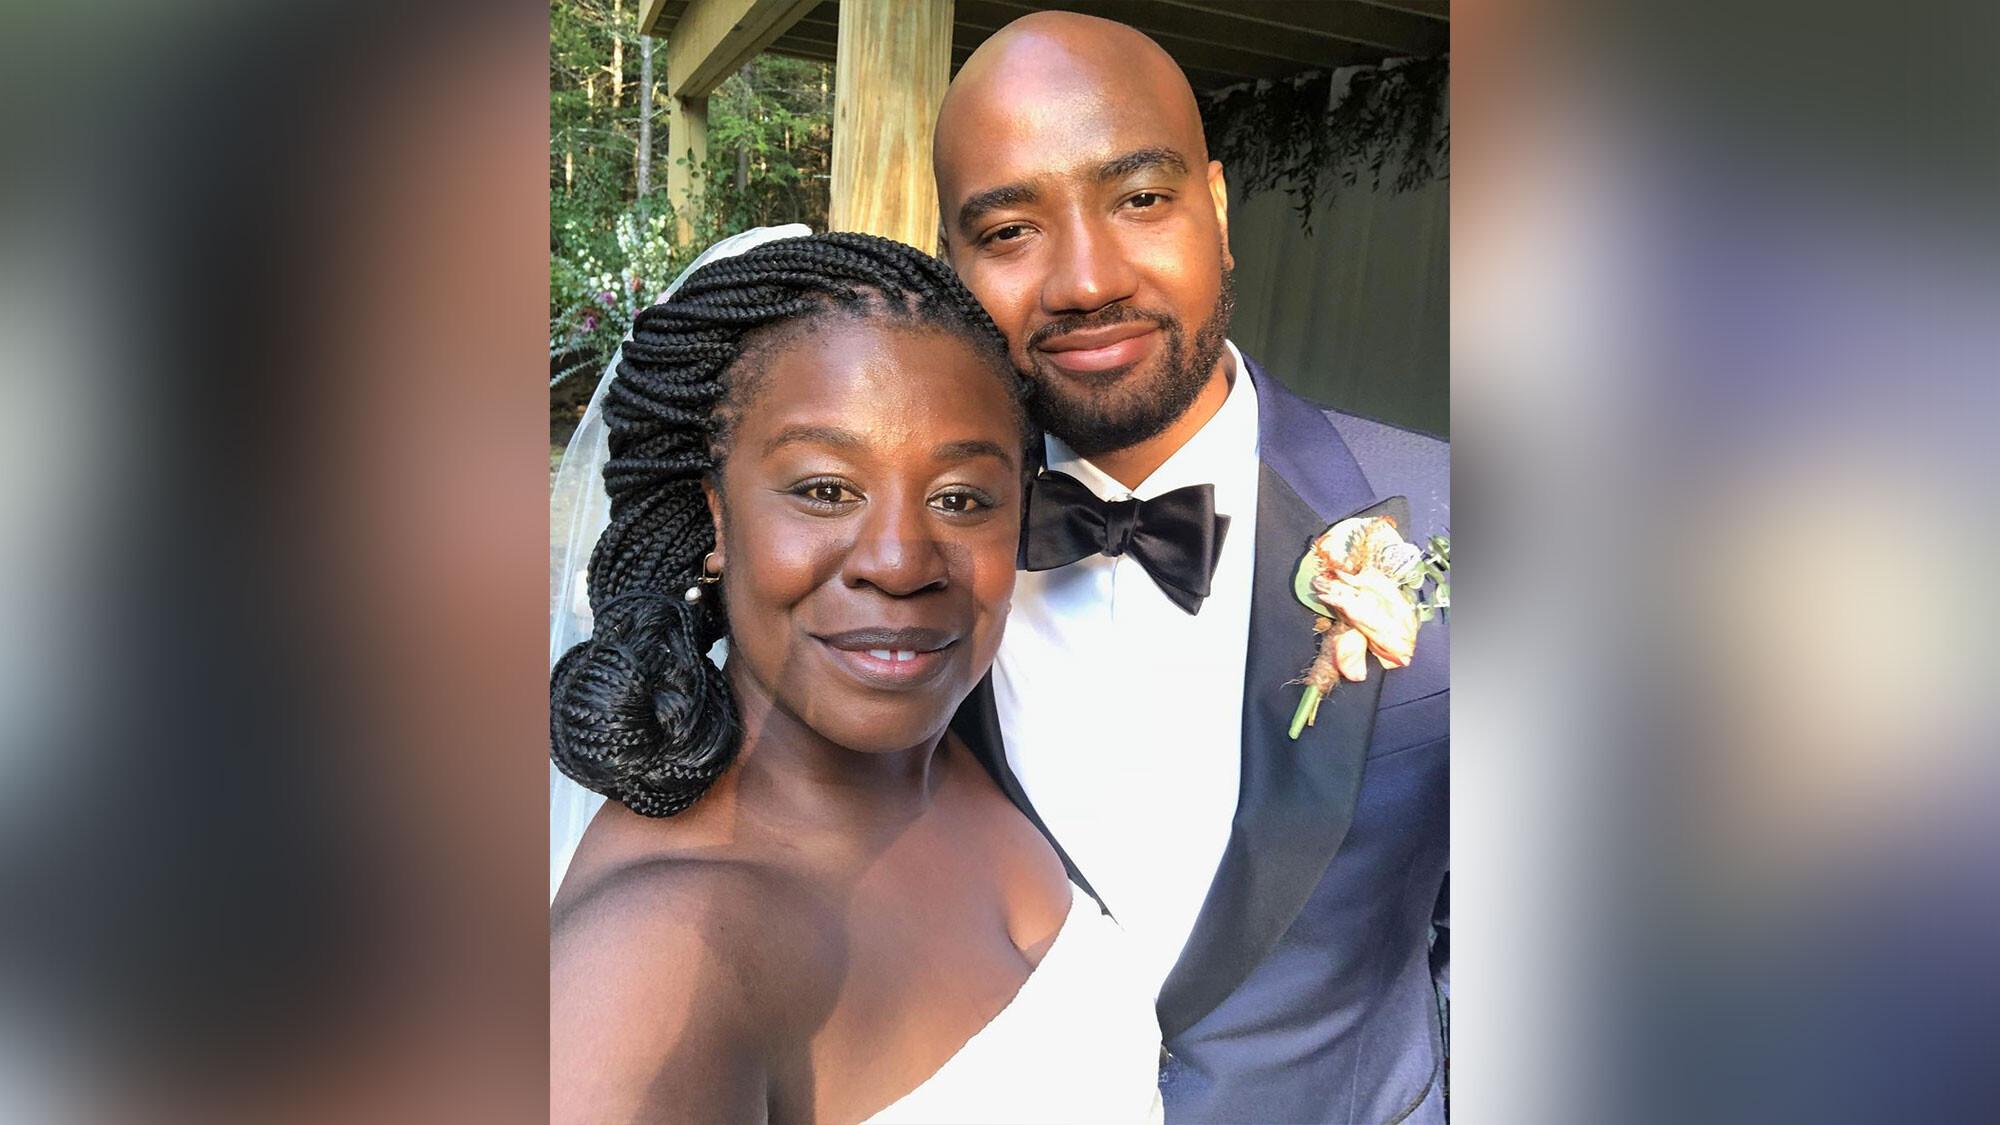 'Orange Is the New Black' star Uzo Aduba reveals she got married last year